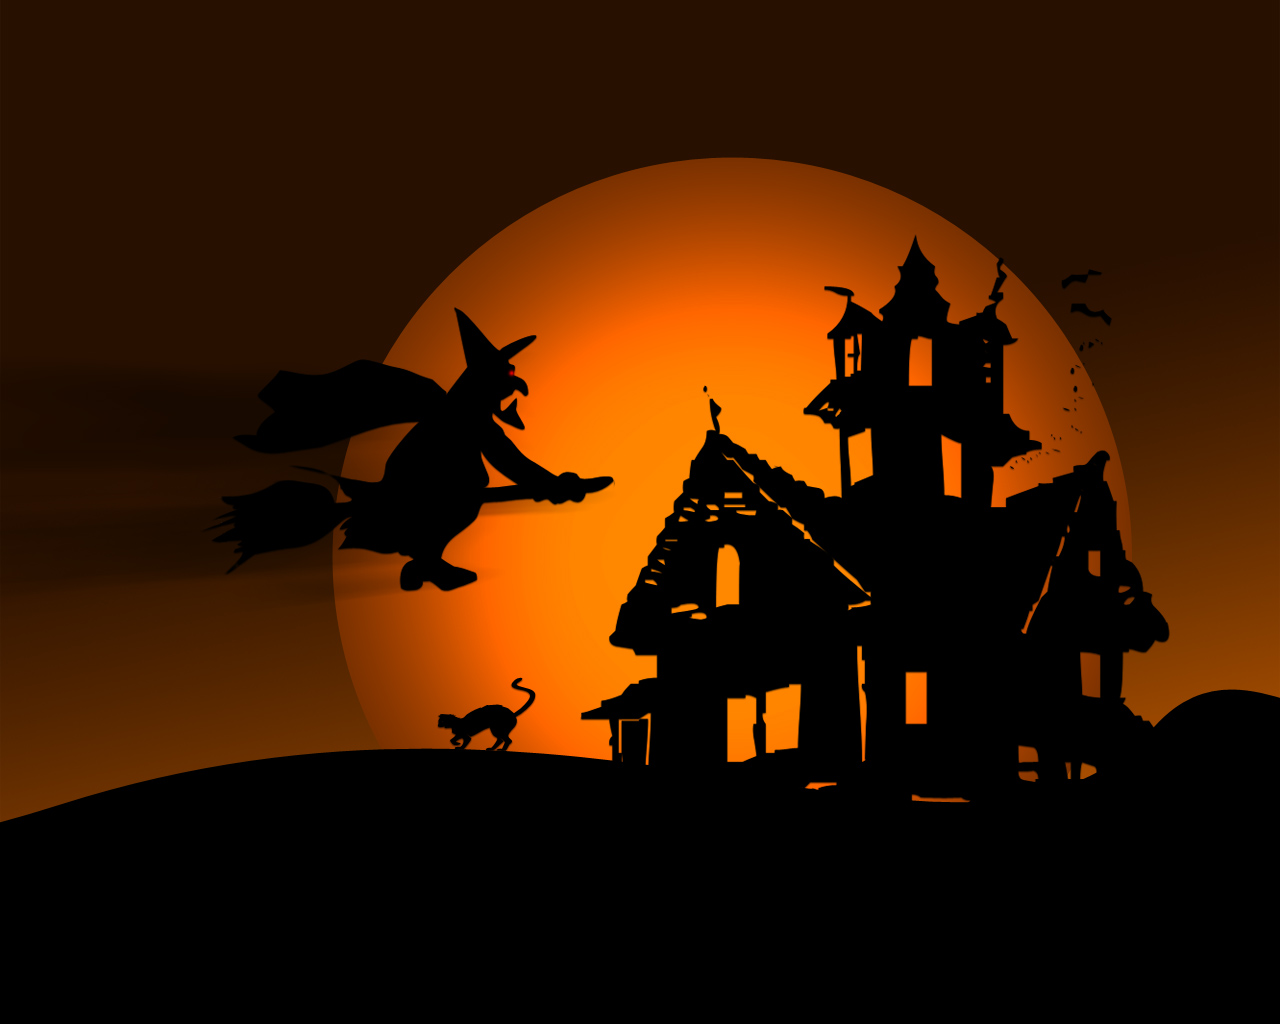 http://1.bp.blogspot.com/_Y8dVgrlzuG0/S60vtuZzExI/AAAAAAAAHX8/NjEsSTGID0A/s1600/halloween.jpg